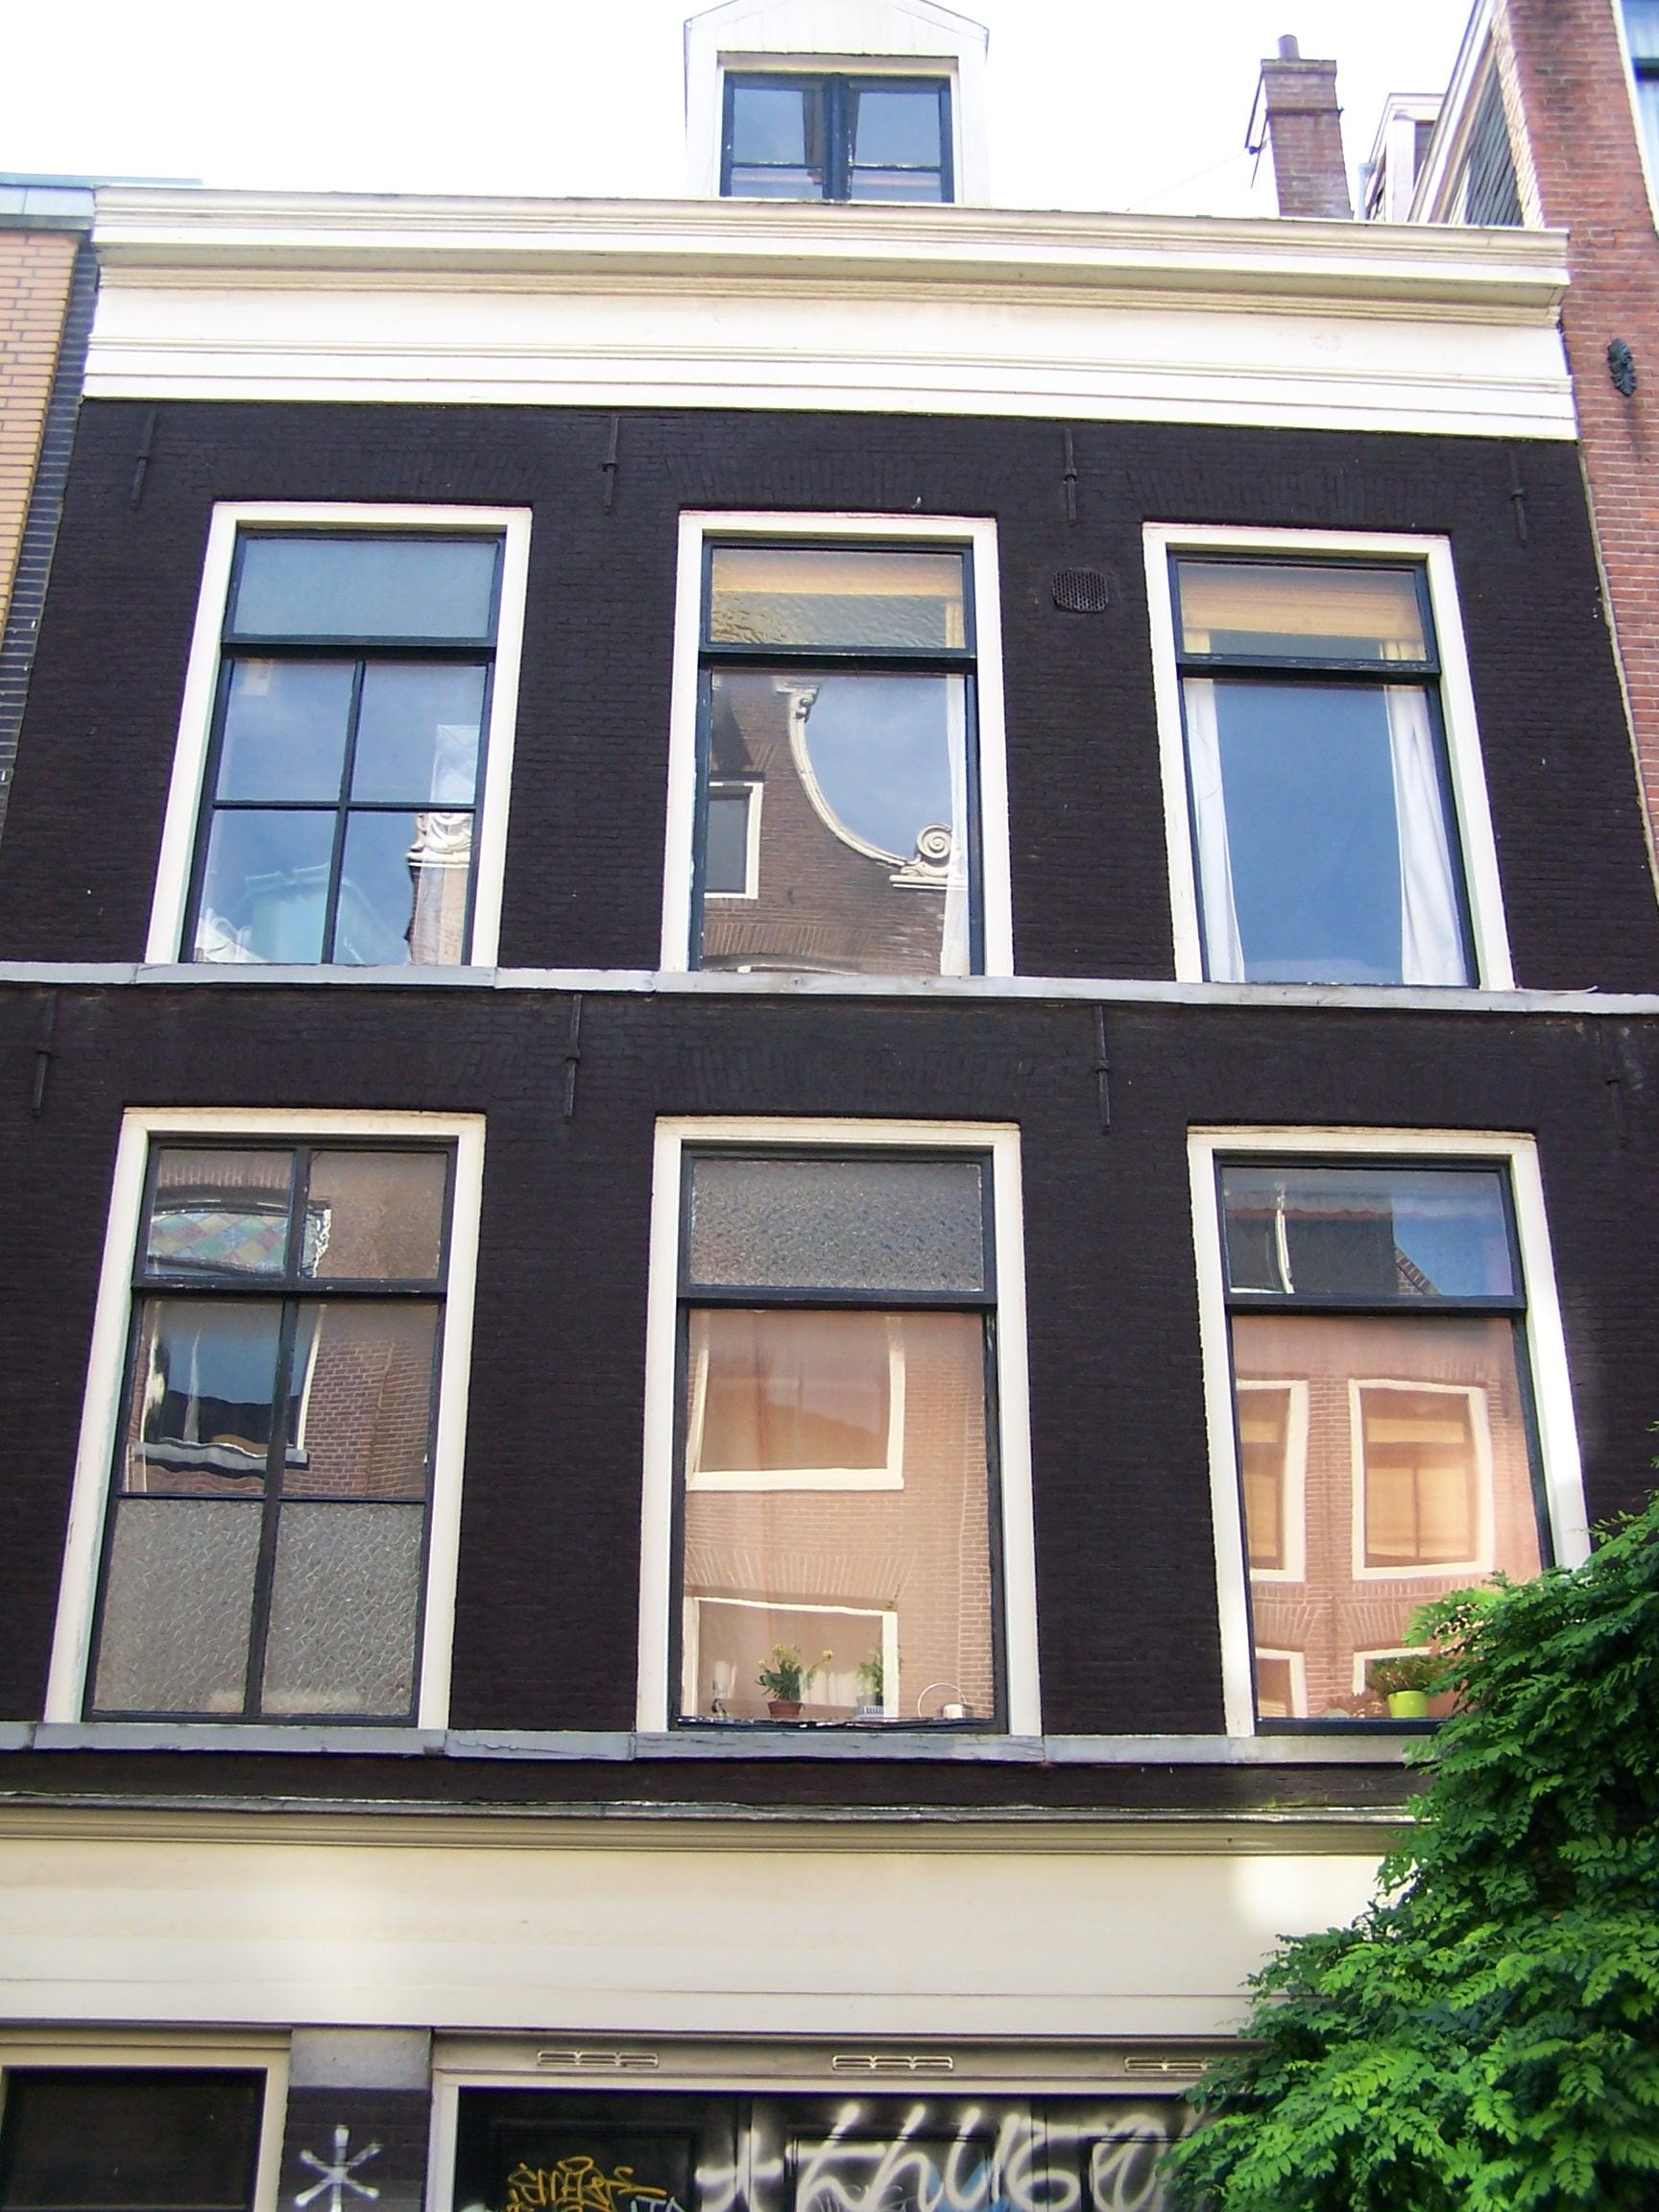 Huis met gevel onder rechte lijst en op moderne pui in amsterdam monument - Moderne huis gevel ...